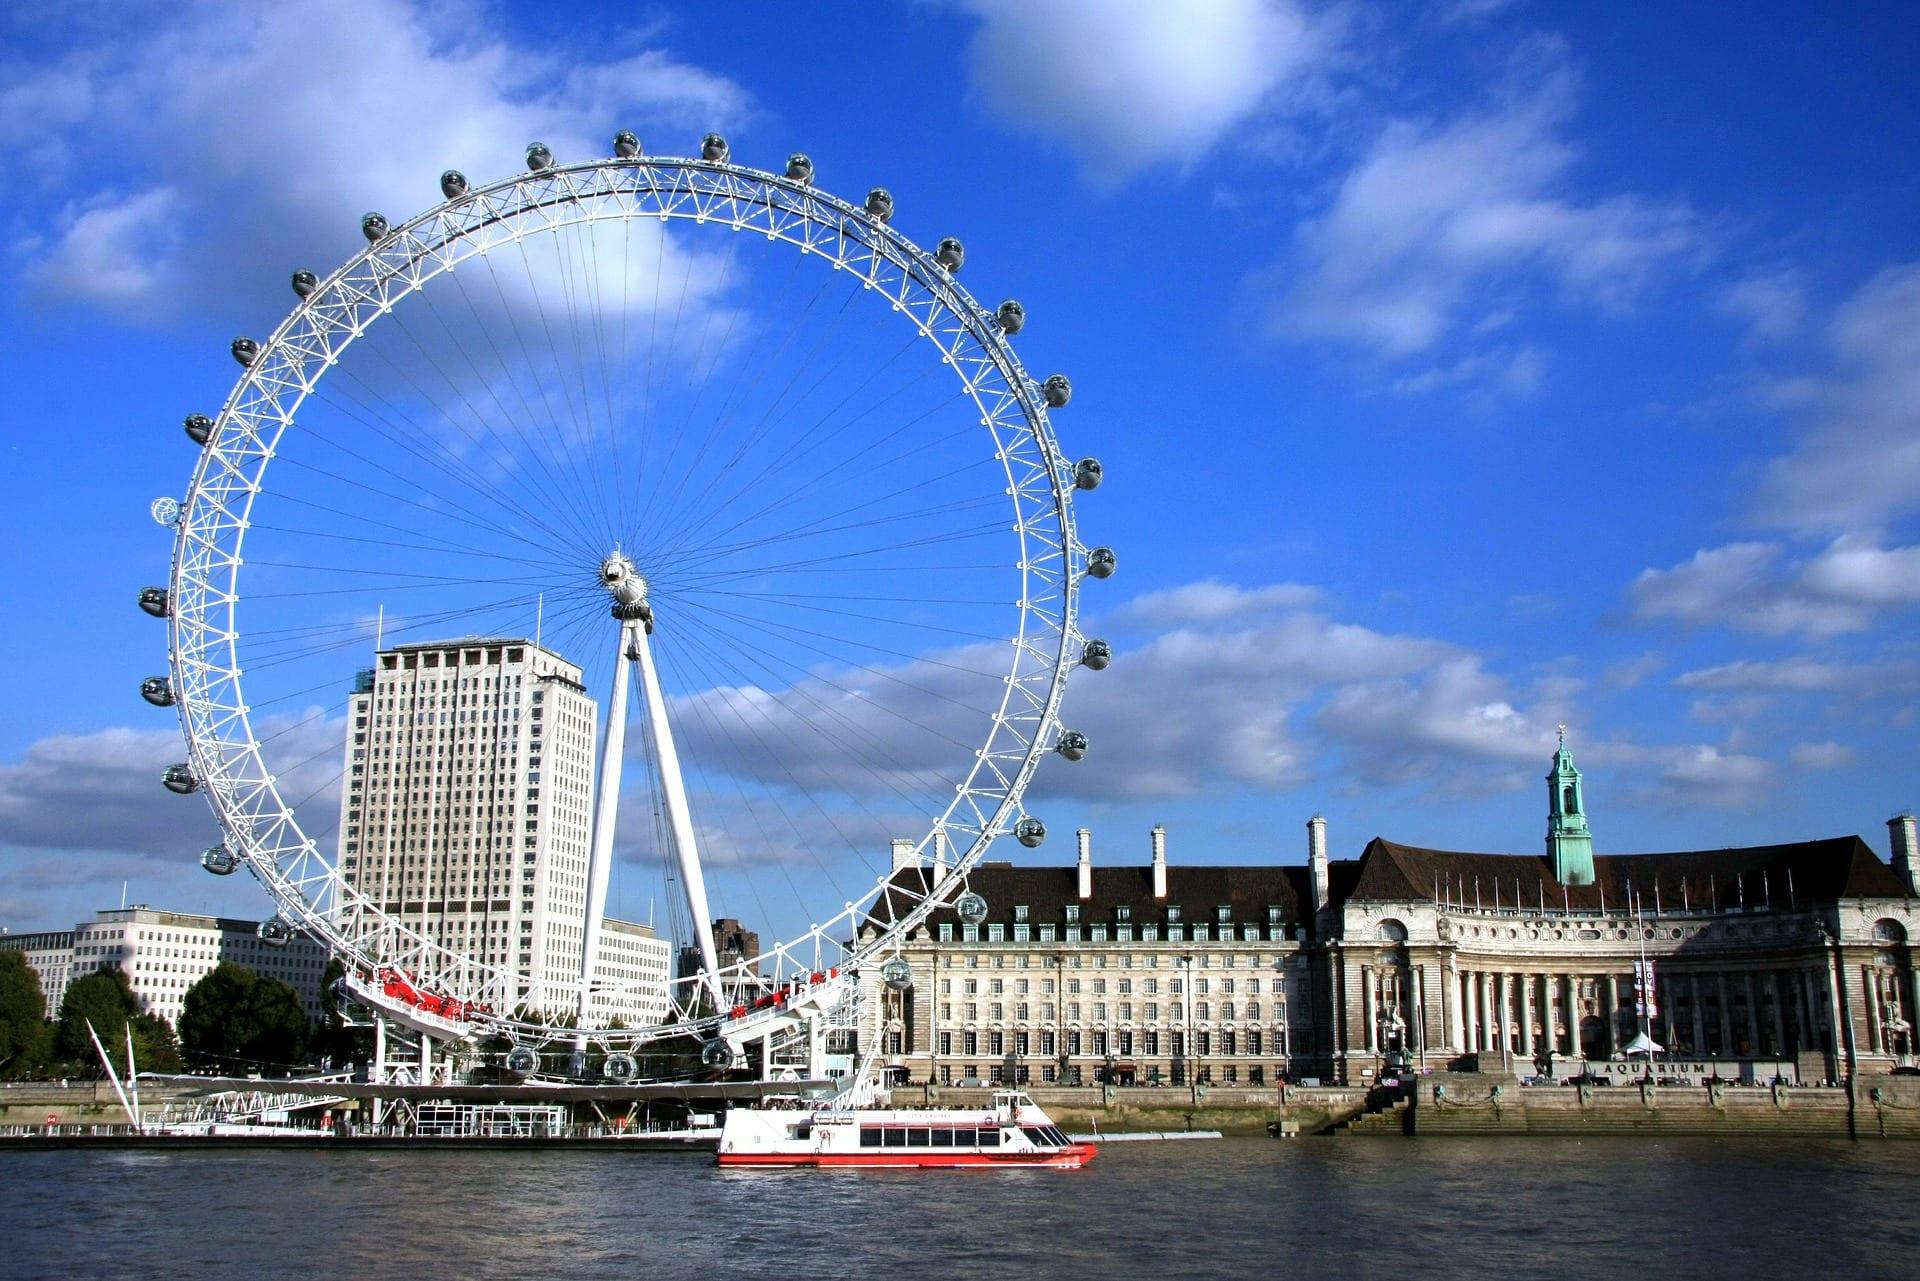 Itinerarios para el viaje de fin de curso a Londres